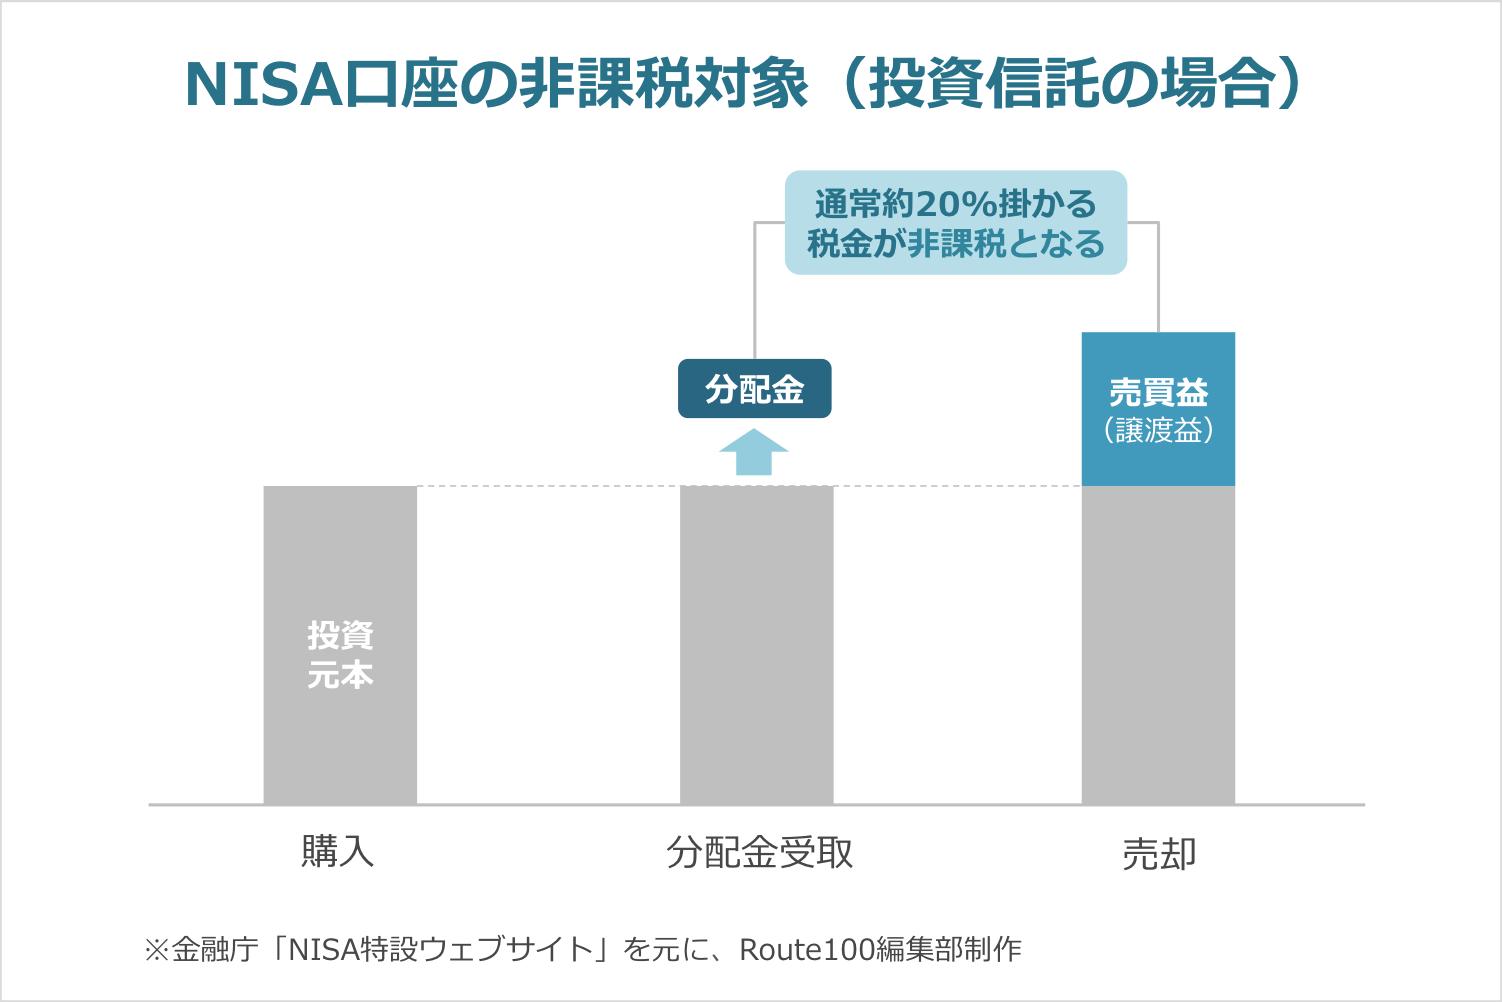 NISA口座の非課税対象